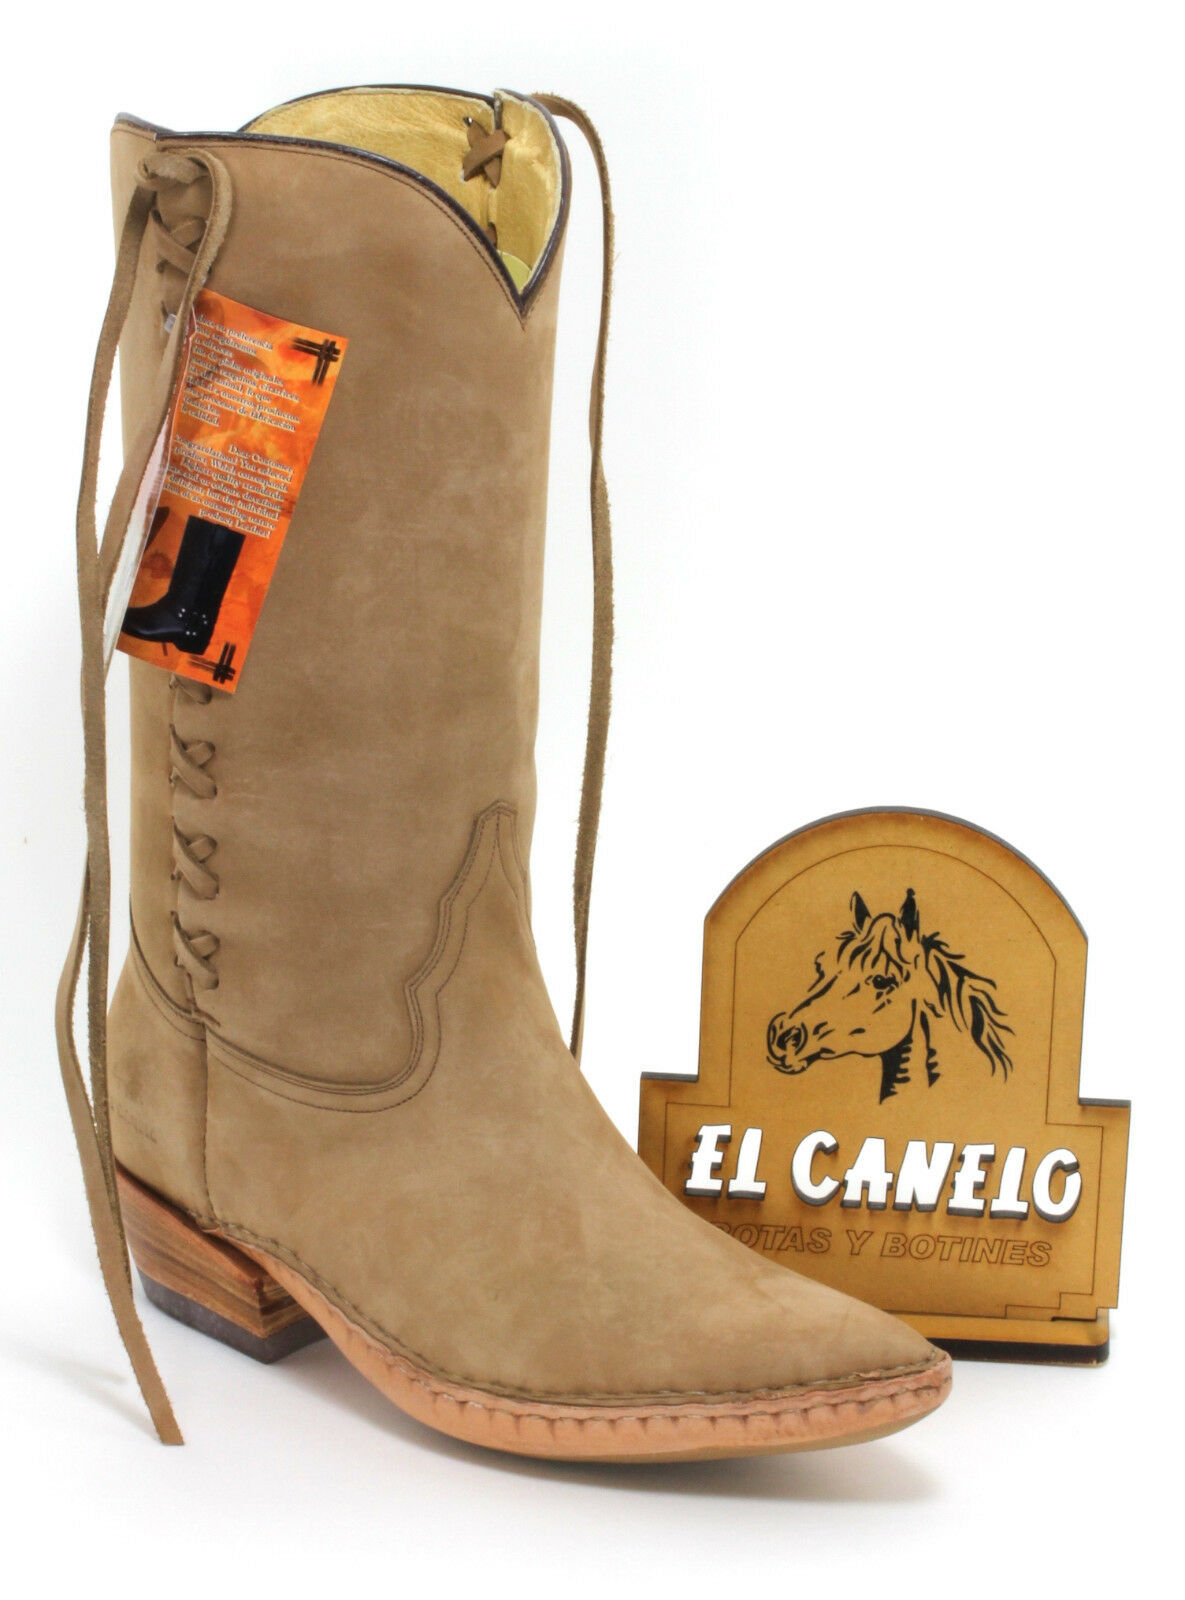 Bottes Bottes Bottes De Cowboy Western Bottes reitbottes Texas bottes catalan style El Canelo 37 241386